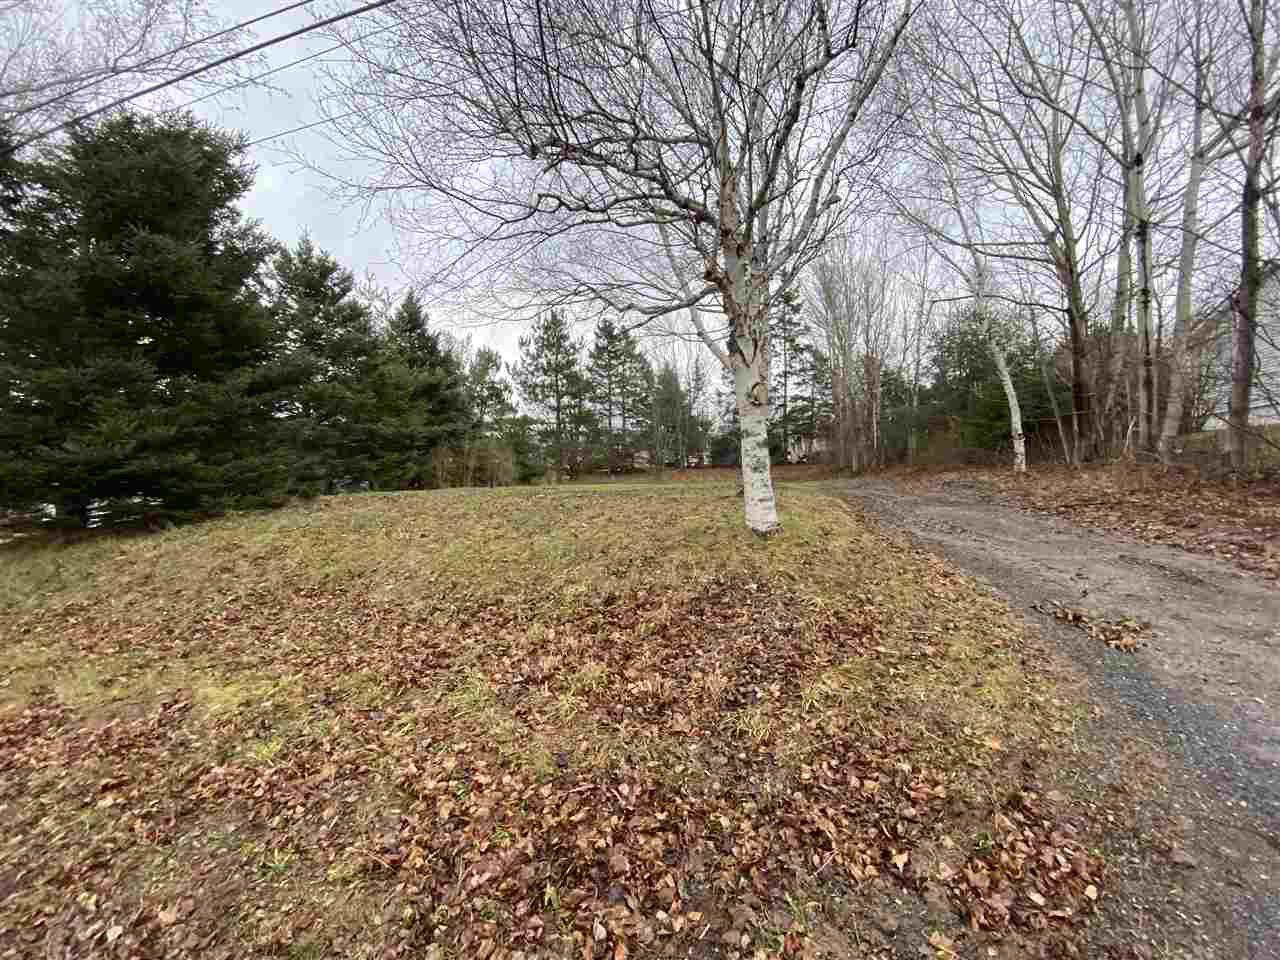 Main Photo: 58 Twelfth Street in Trenton: 107-Trenton,Westville,Pictou Vacant Land for sale (Northern Region)  : MLS®# 202100285